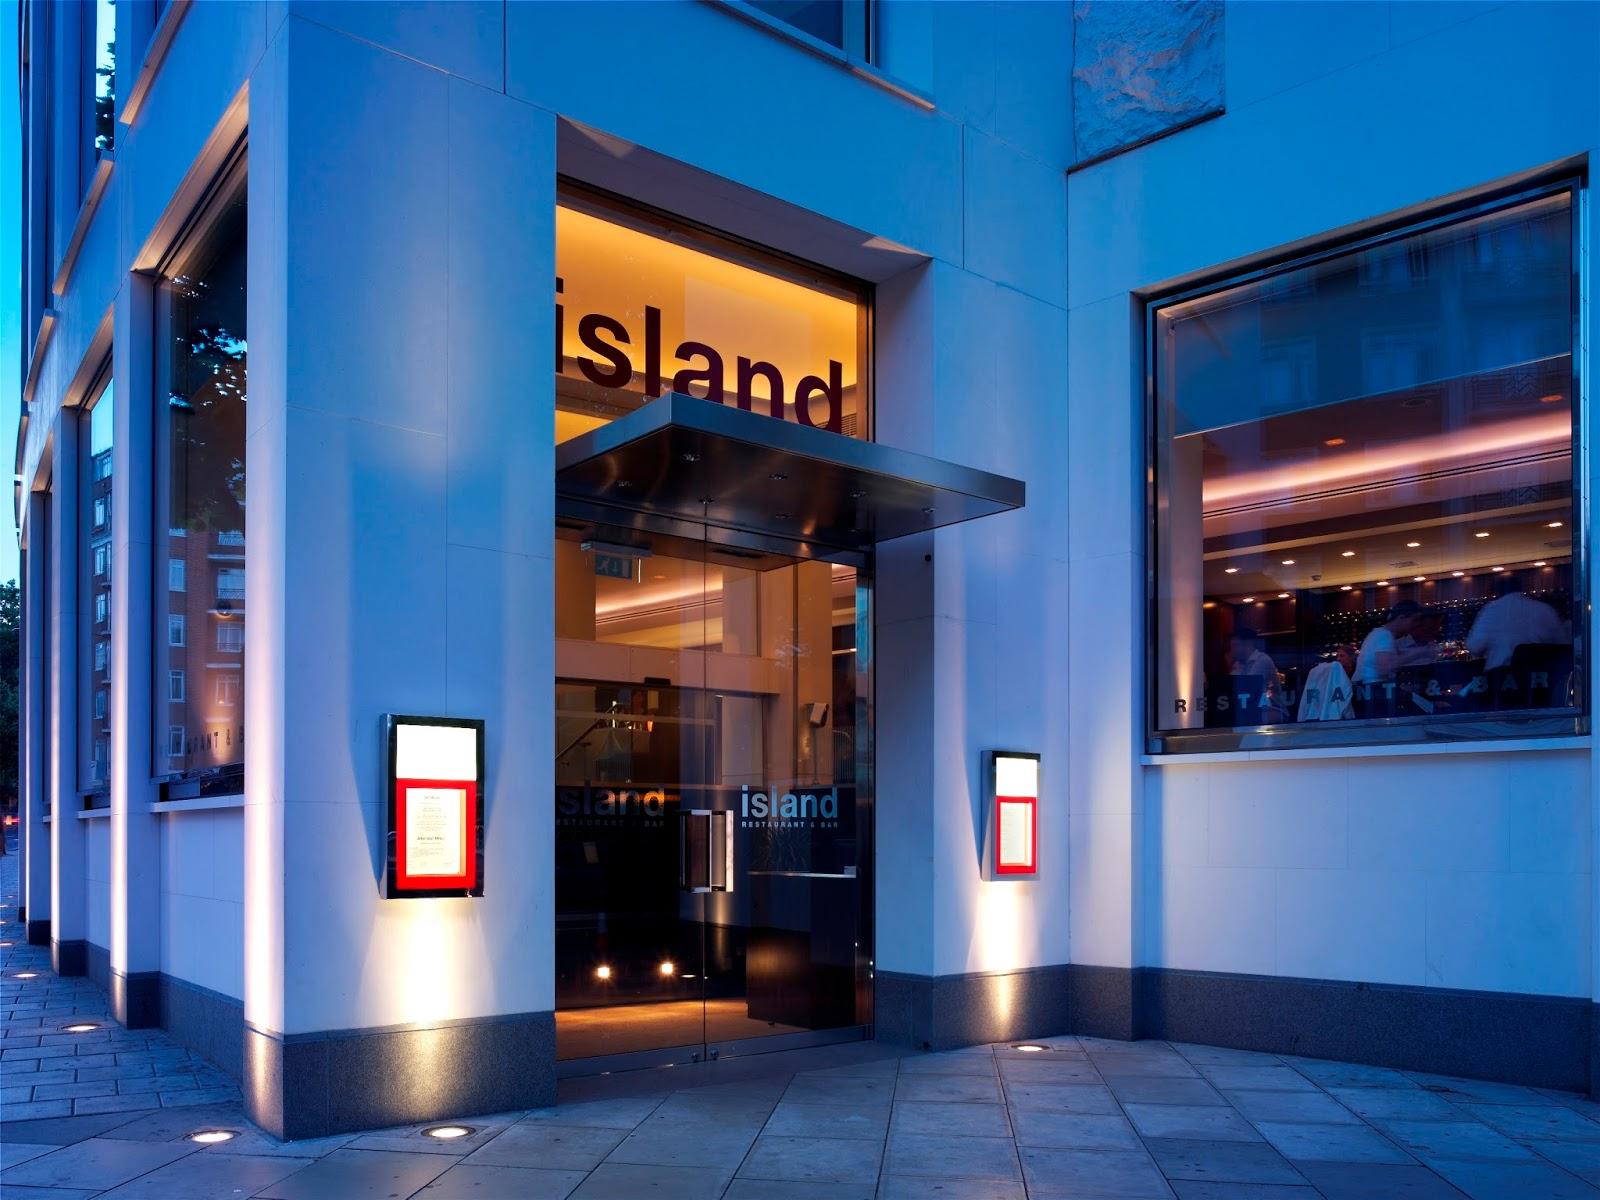 Island Grill Restaurant London